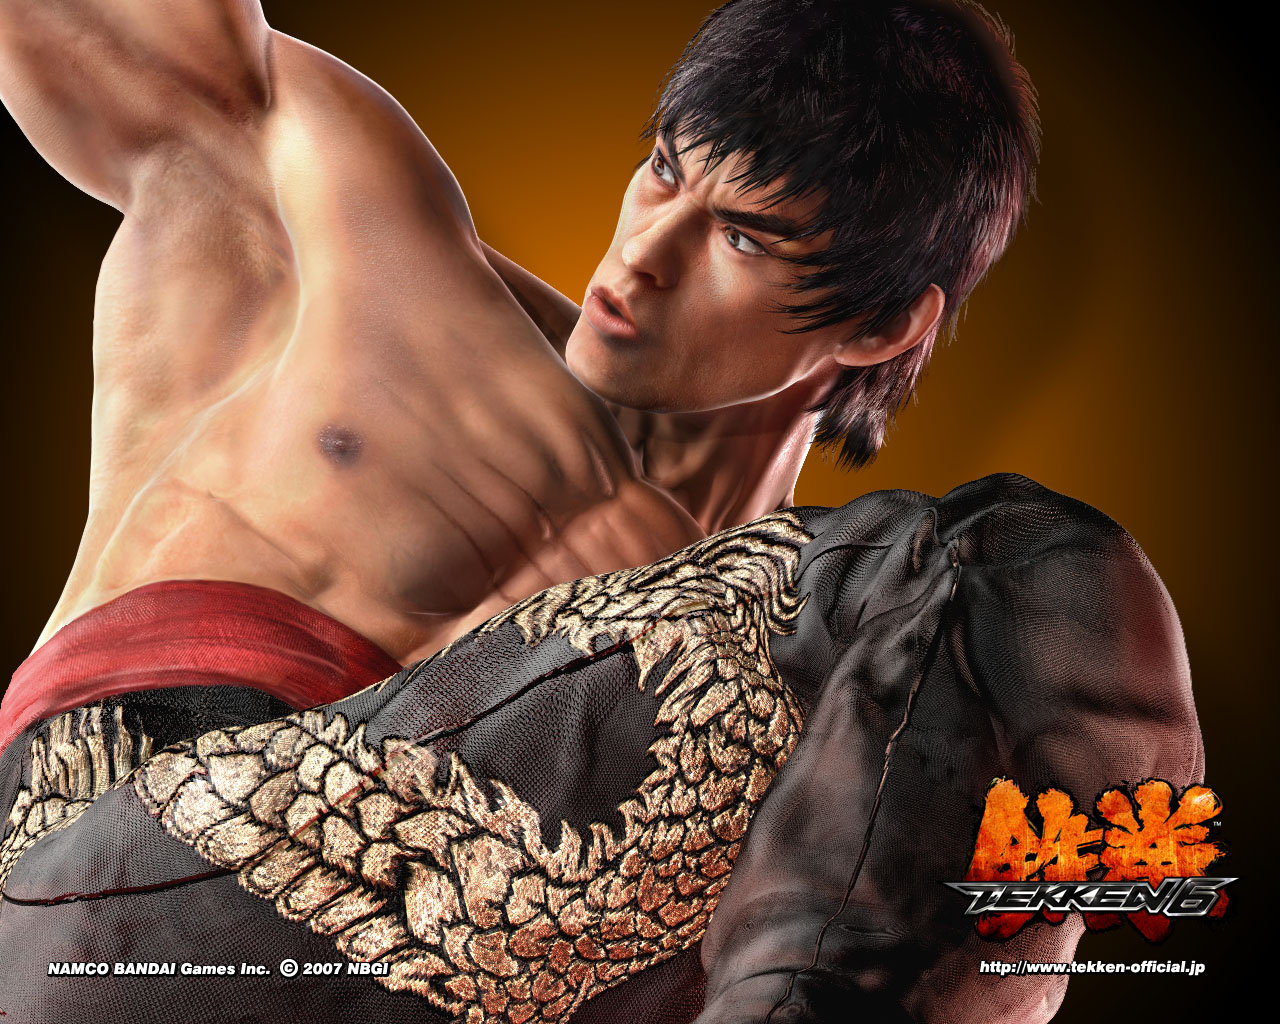 Free Download Armor King Tekken Hd Wallpapers Images